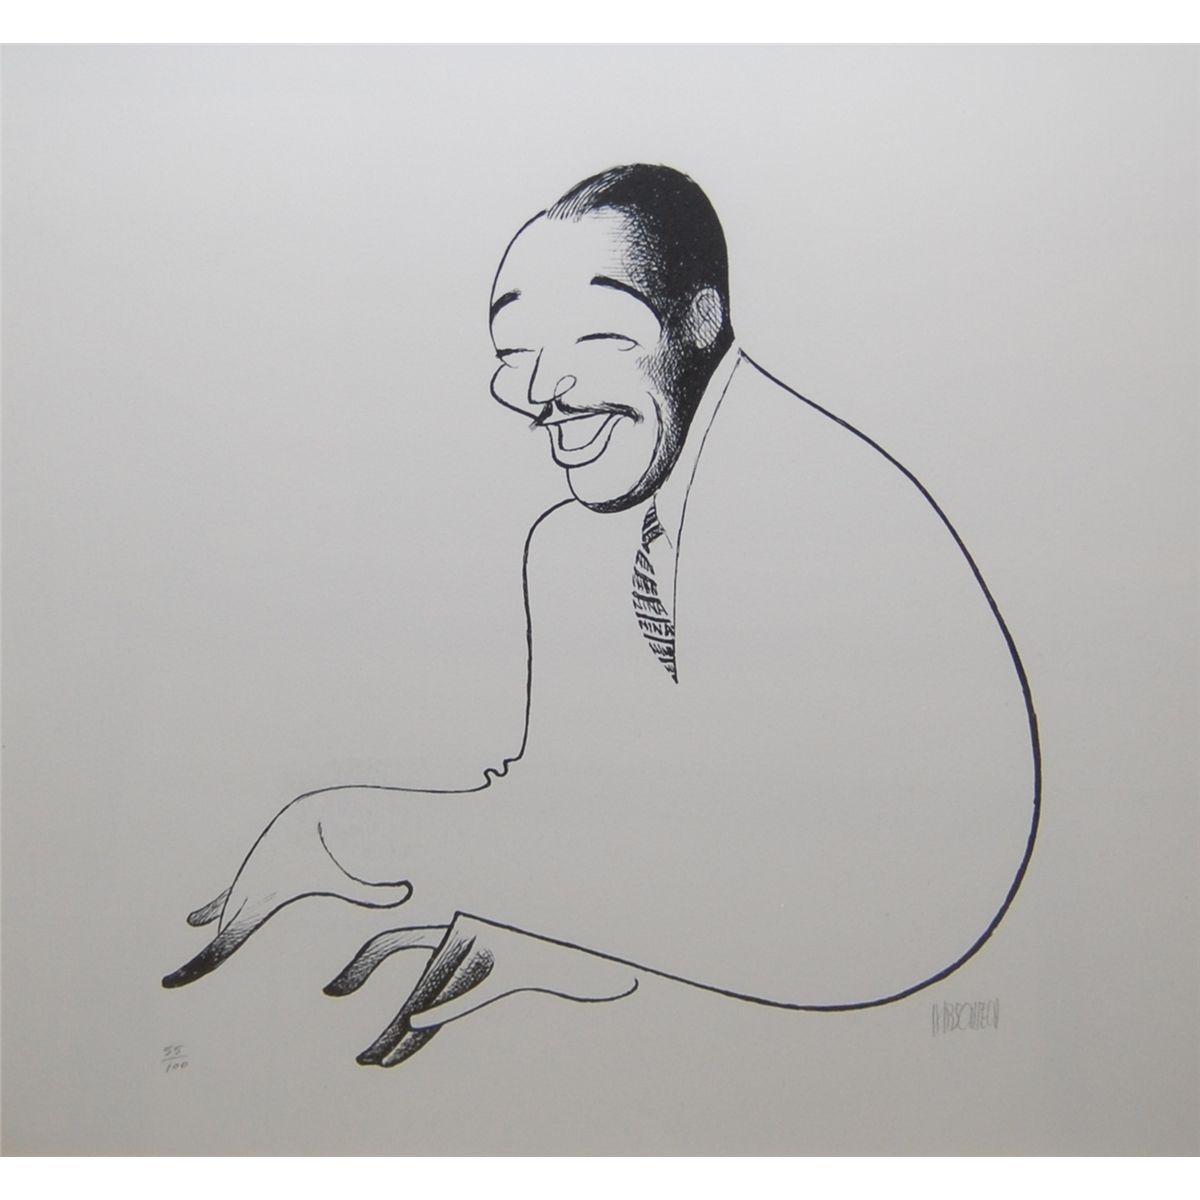 Duke Ellington Caricature Artist Caricature Black And White Portraits